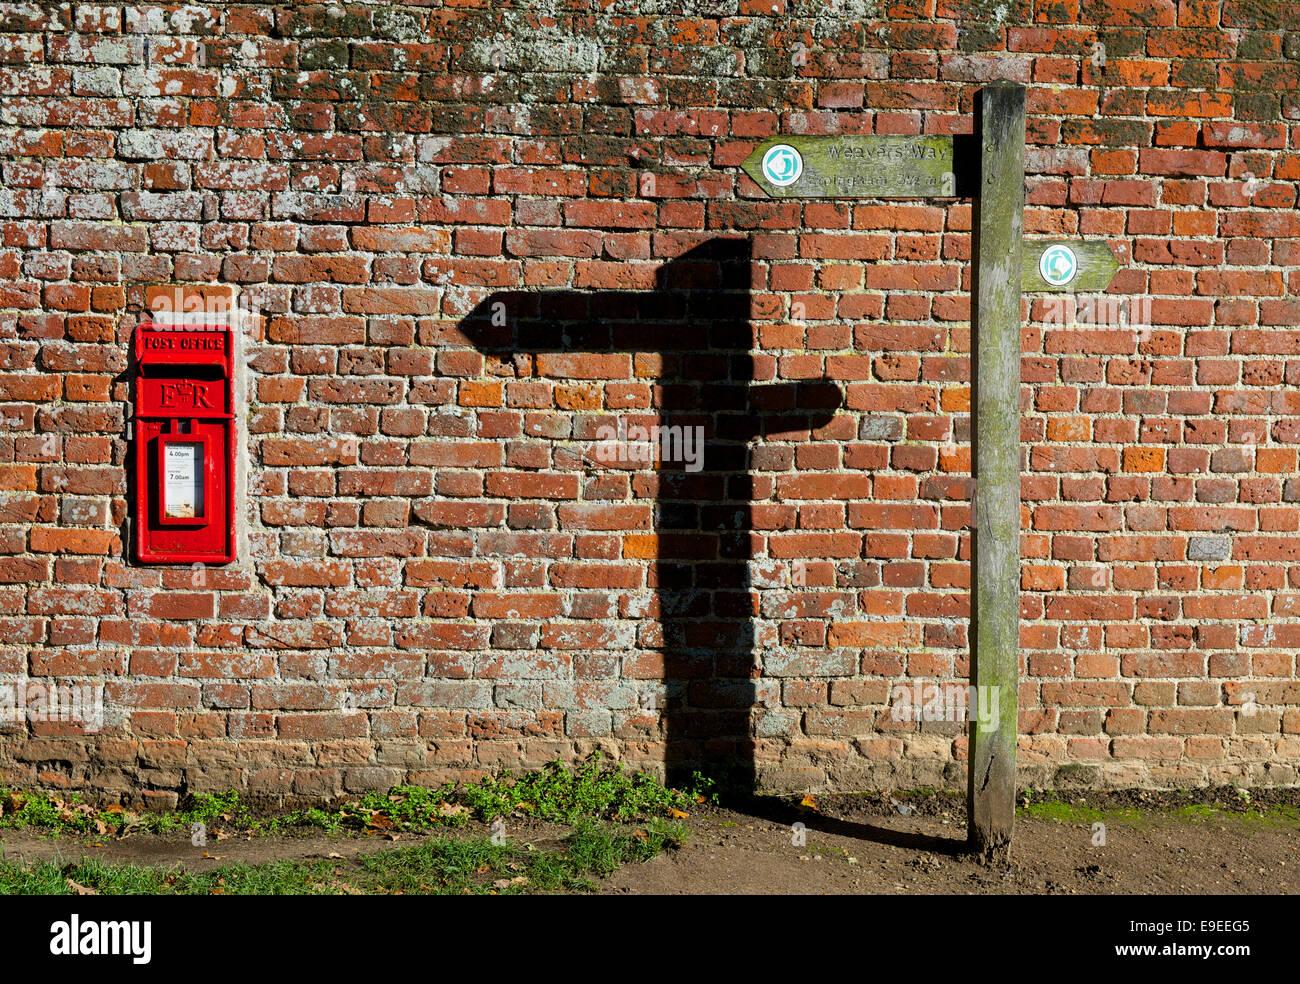 Fingerpost for the Weavers Way, Blickling, Norfolk, England UK - Stock Image